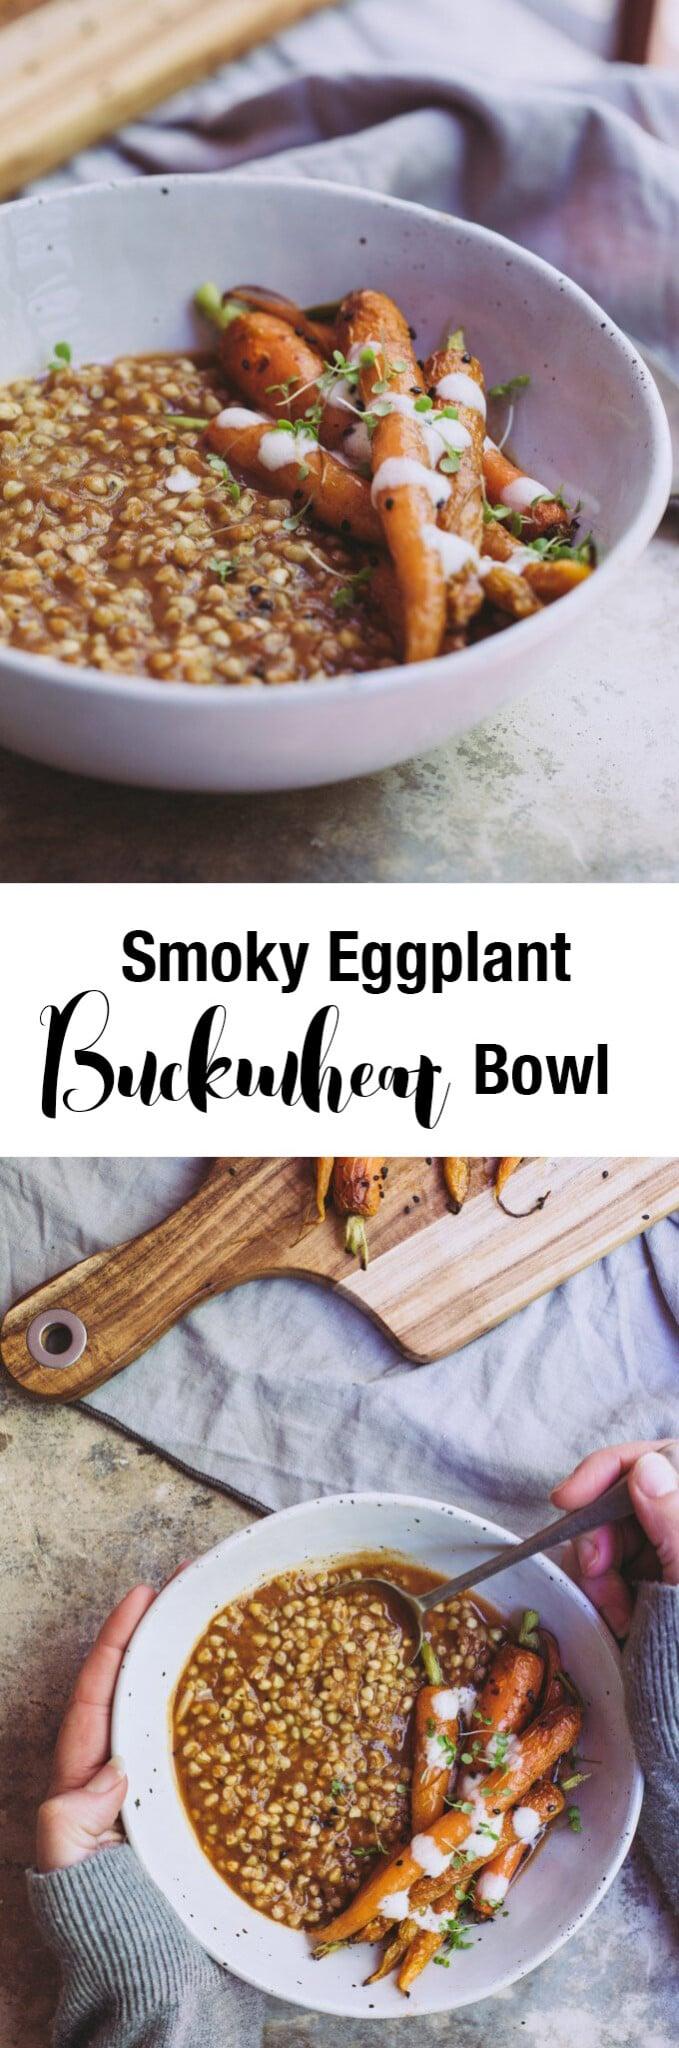 smoky-egplant-buckwheat-bowl-pin